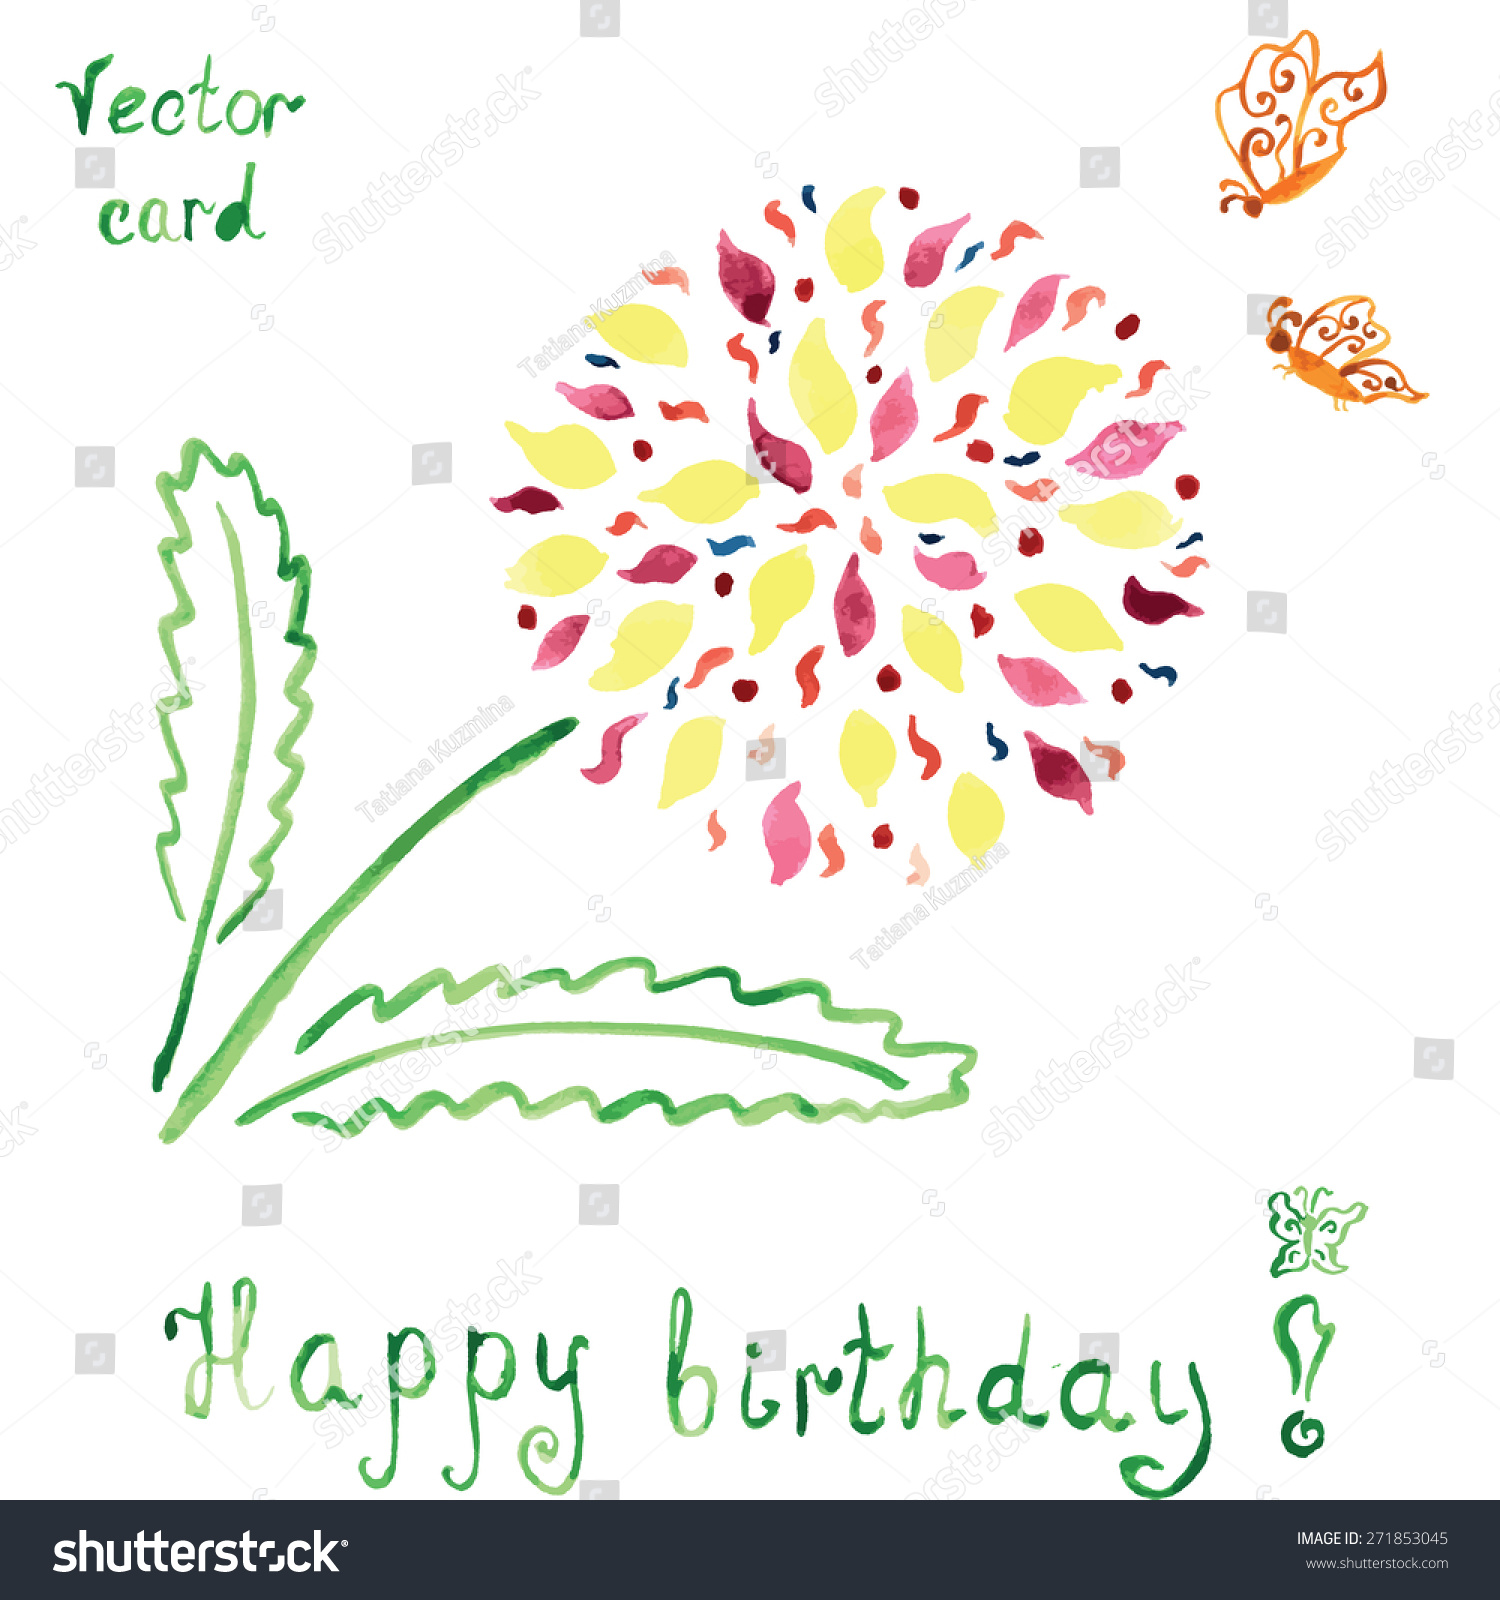 Cbeebies Birthday Cards Iplayer Gallery Free Birthday Cards